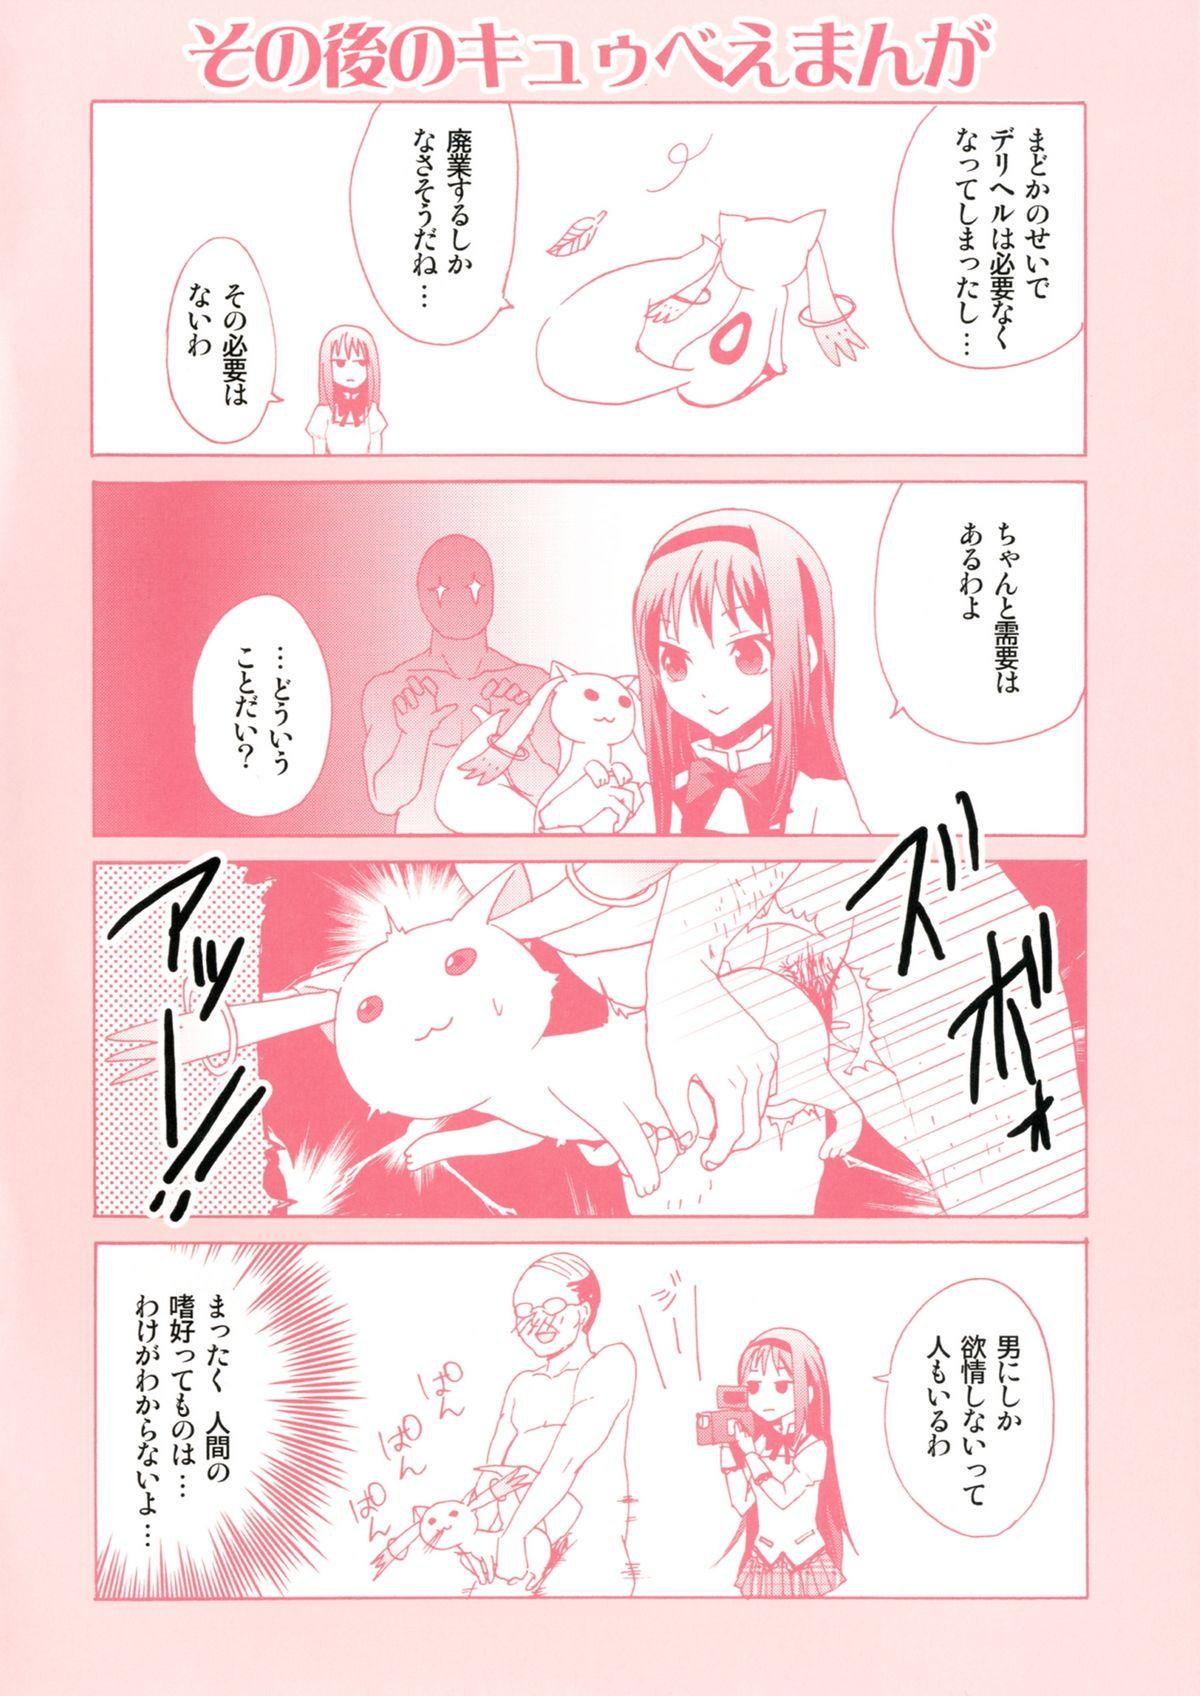 Mahou Fuzoku Deli heal Magica 4 23